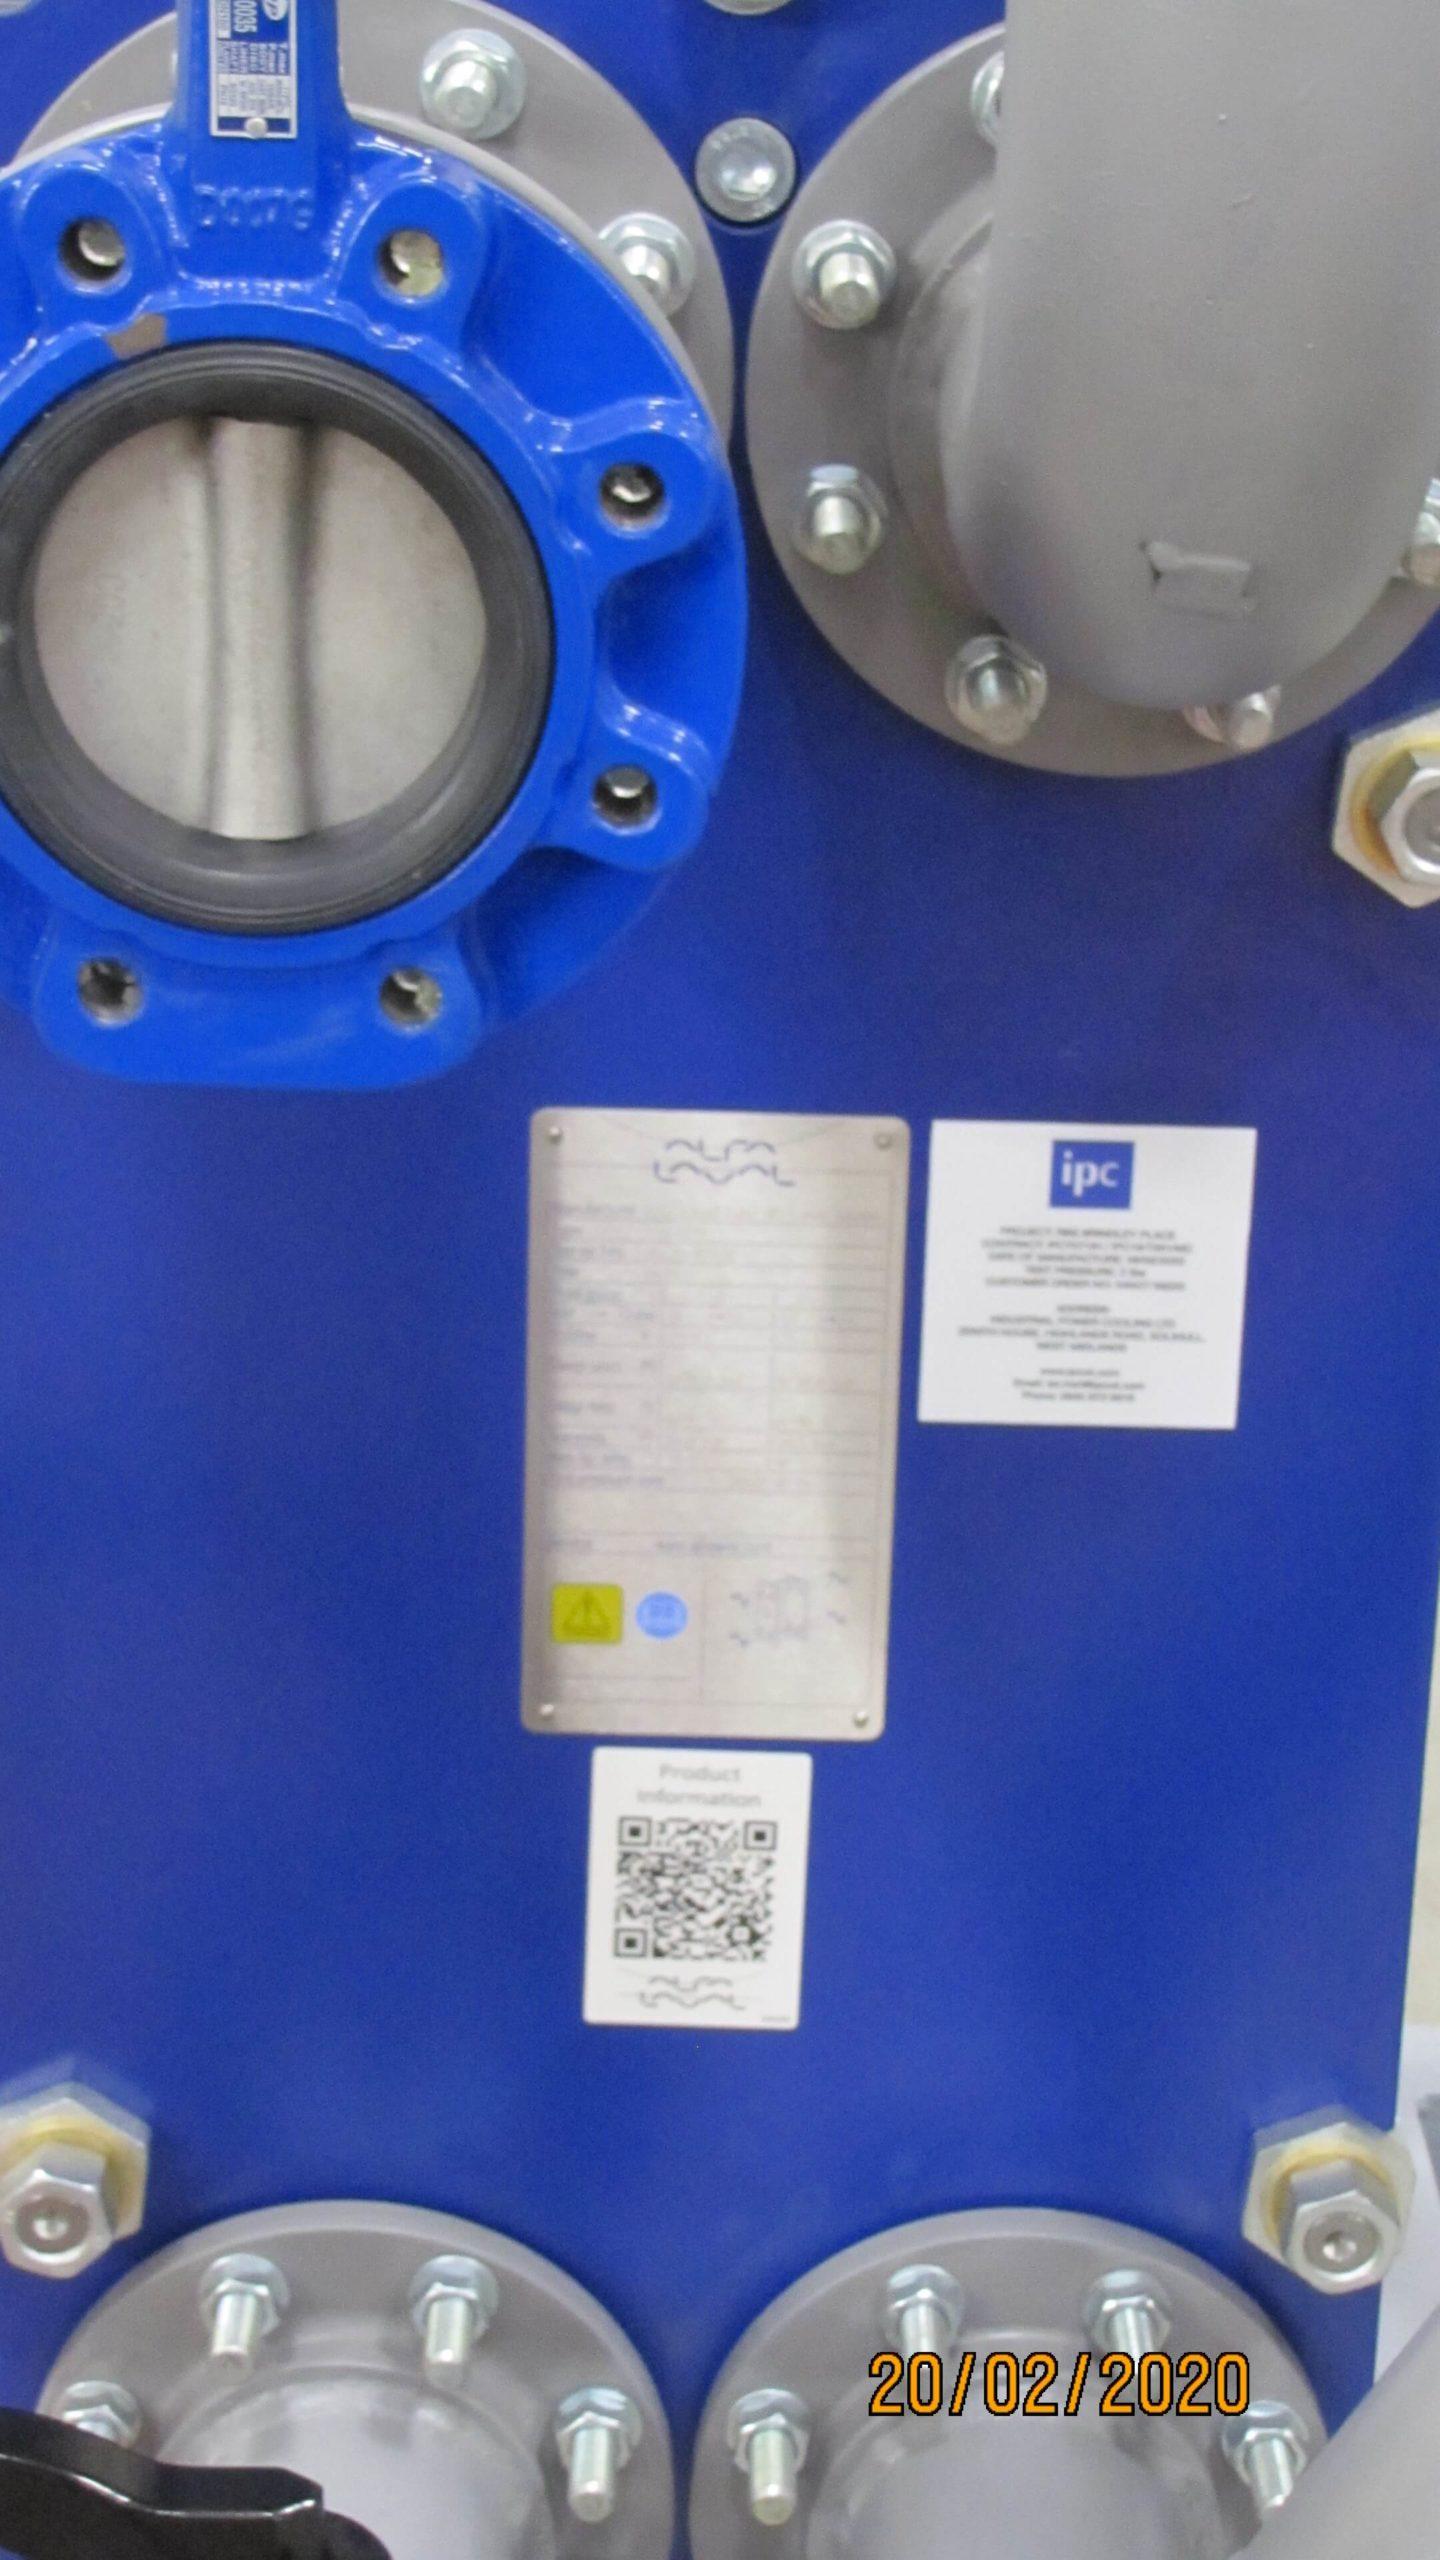 remote radiator AVK Himoinsa Gen low-level cooling system